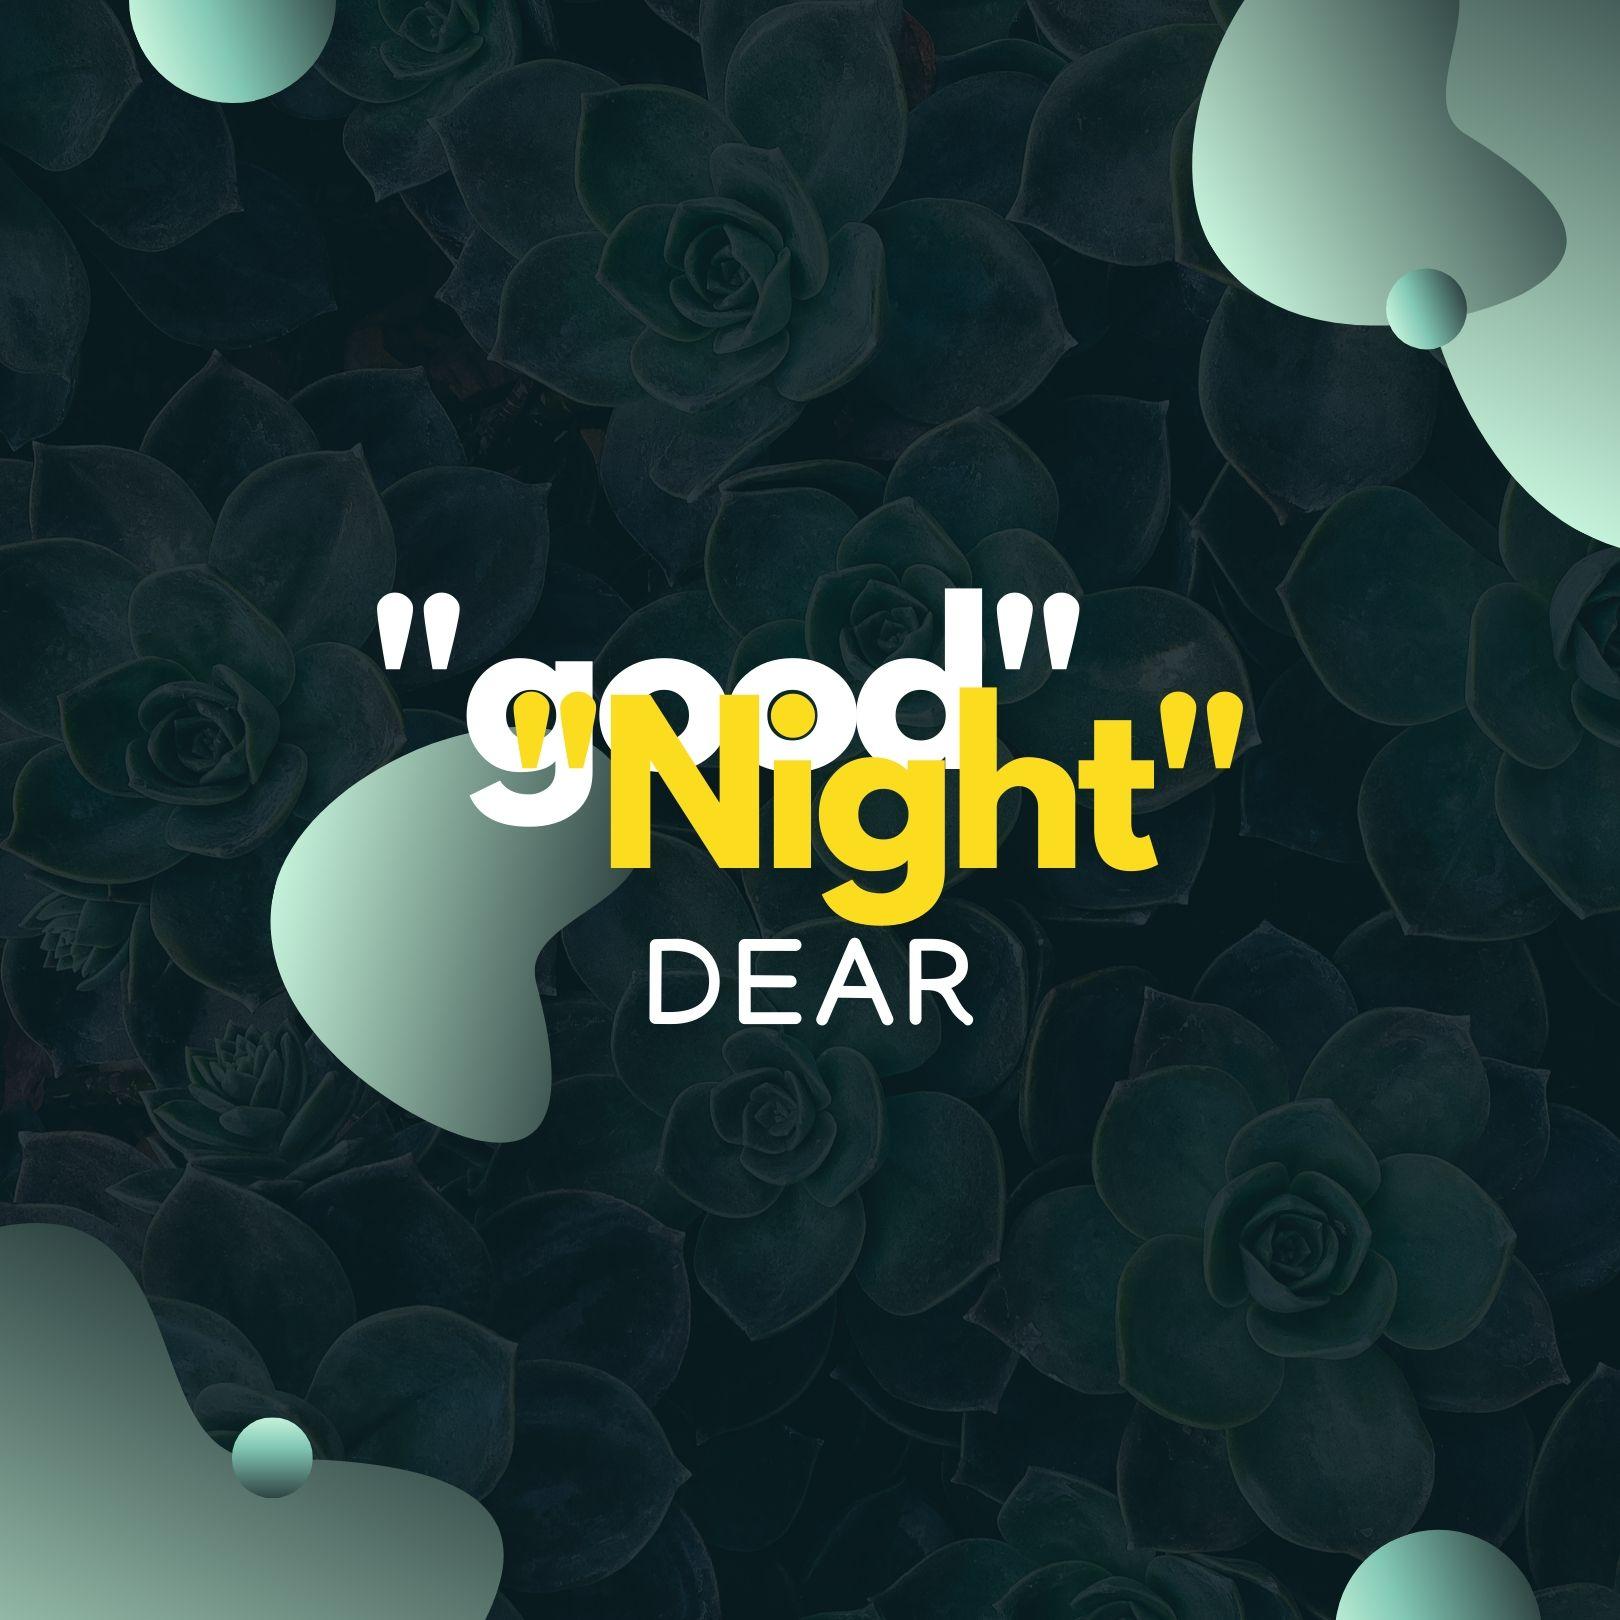 Good Night Dear Love image full HD free download.